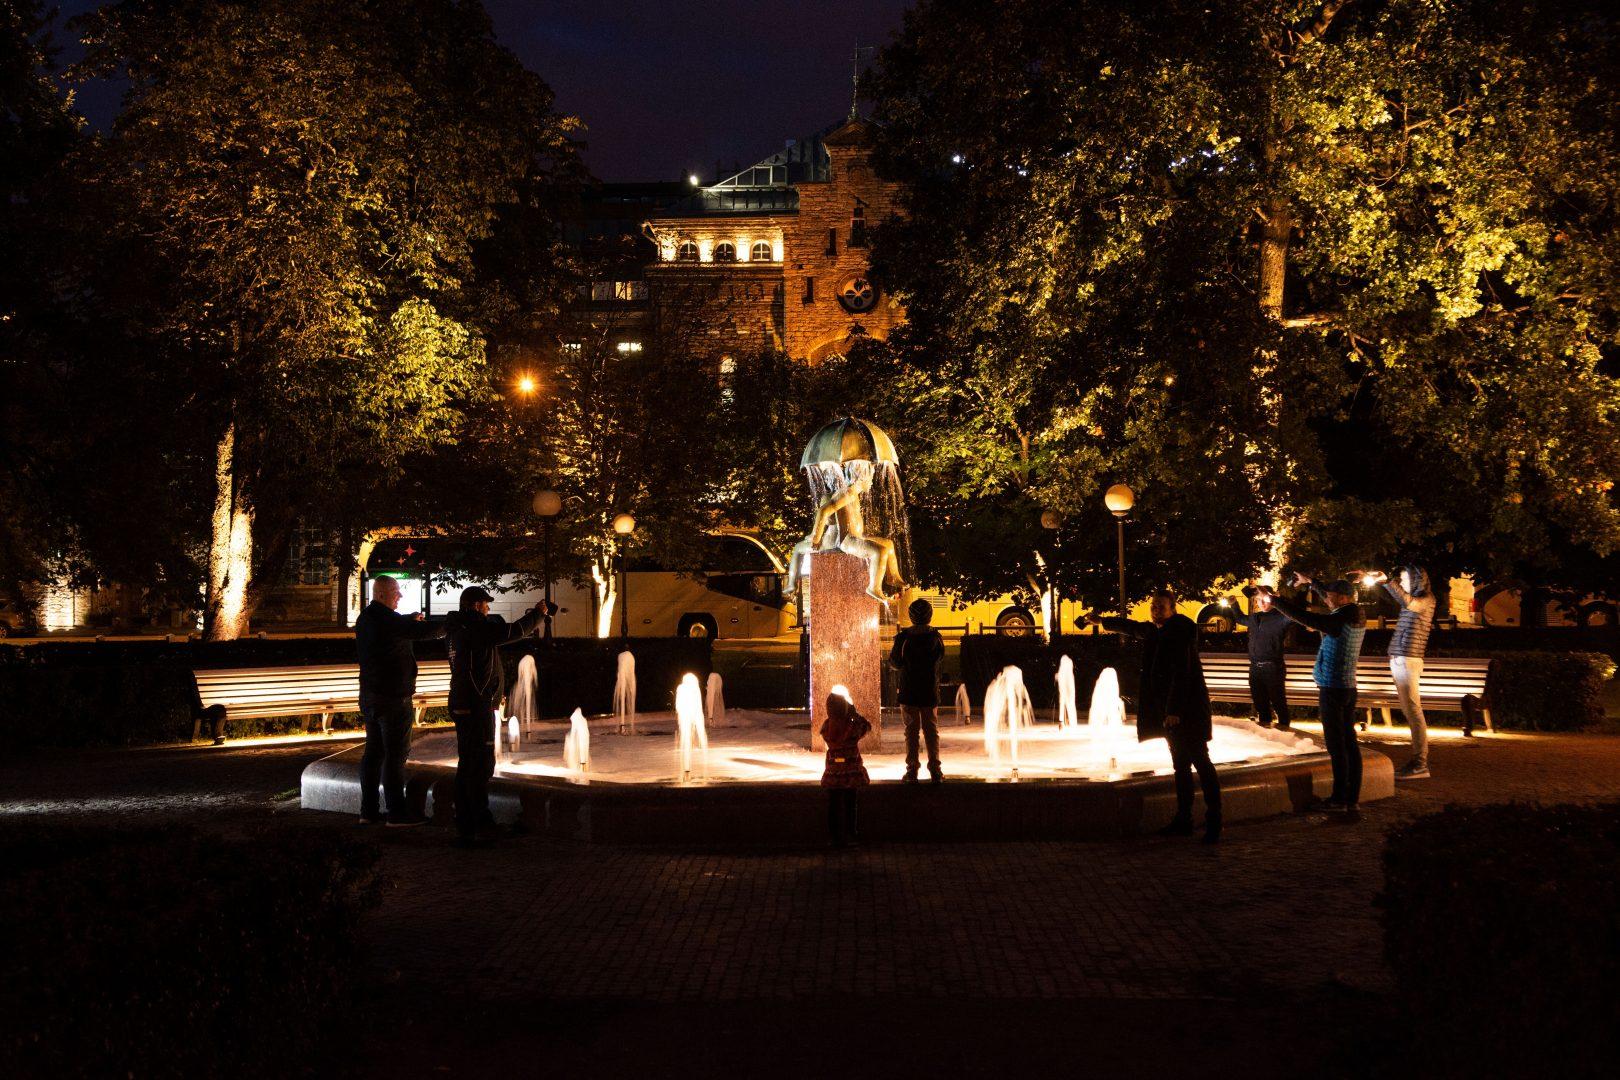 Guerilla Lighting Workshop In The Canute Garden, LUCIA's Pilot Site In Tallinn, Estonia